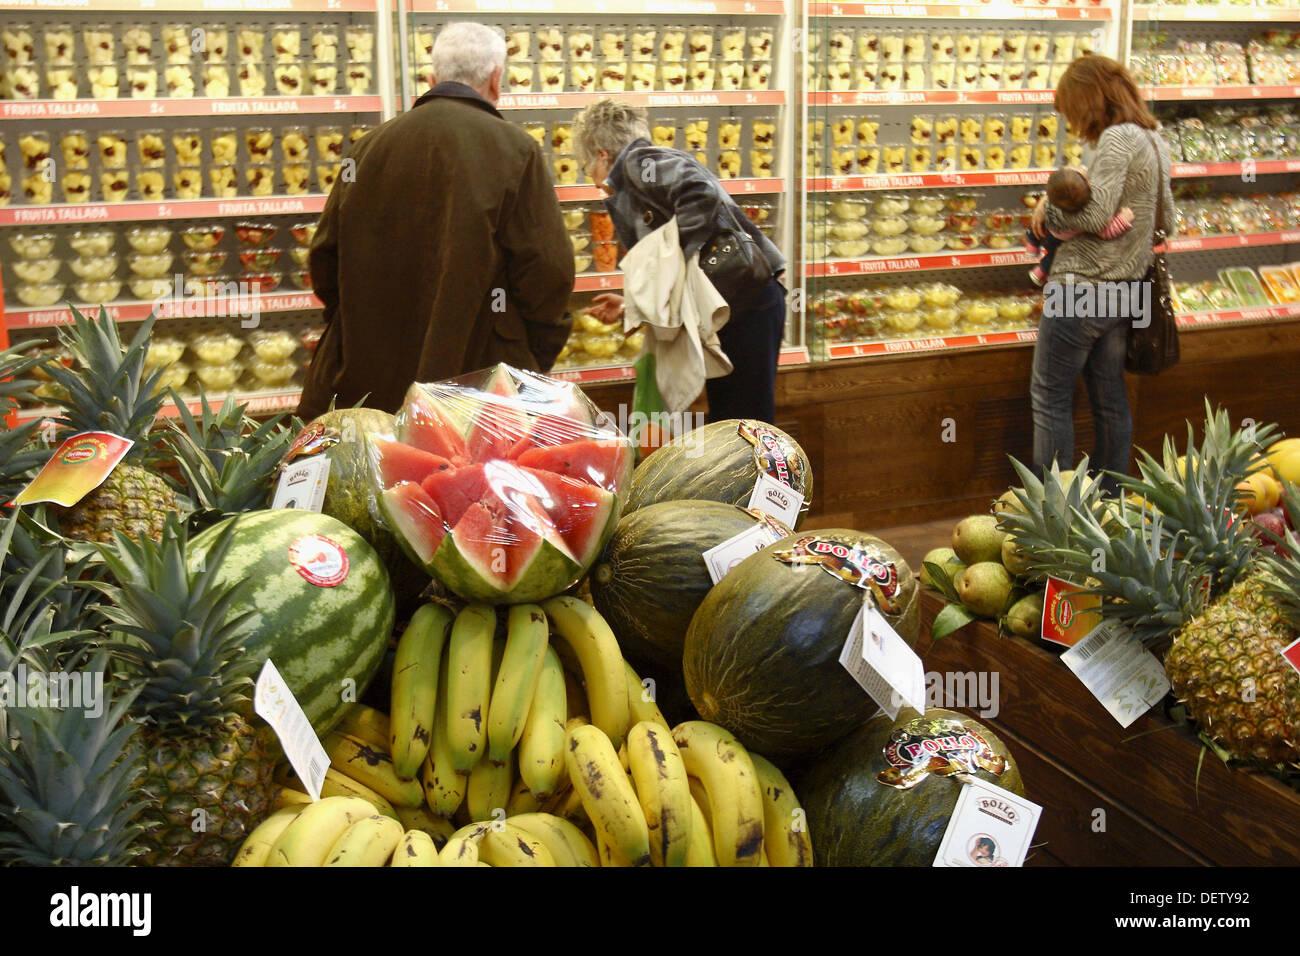 Fruits, Barcelona Degusta consumer food show, Barcelona, Catalonia, Spain - Stock Image